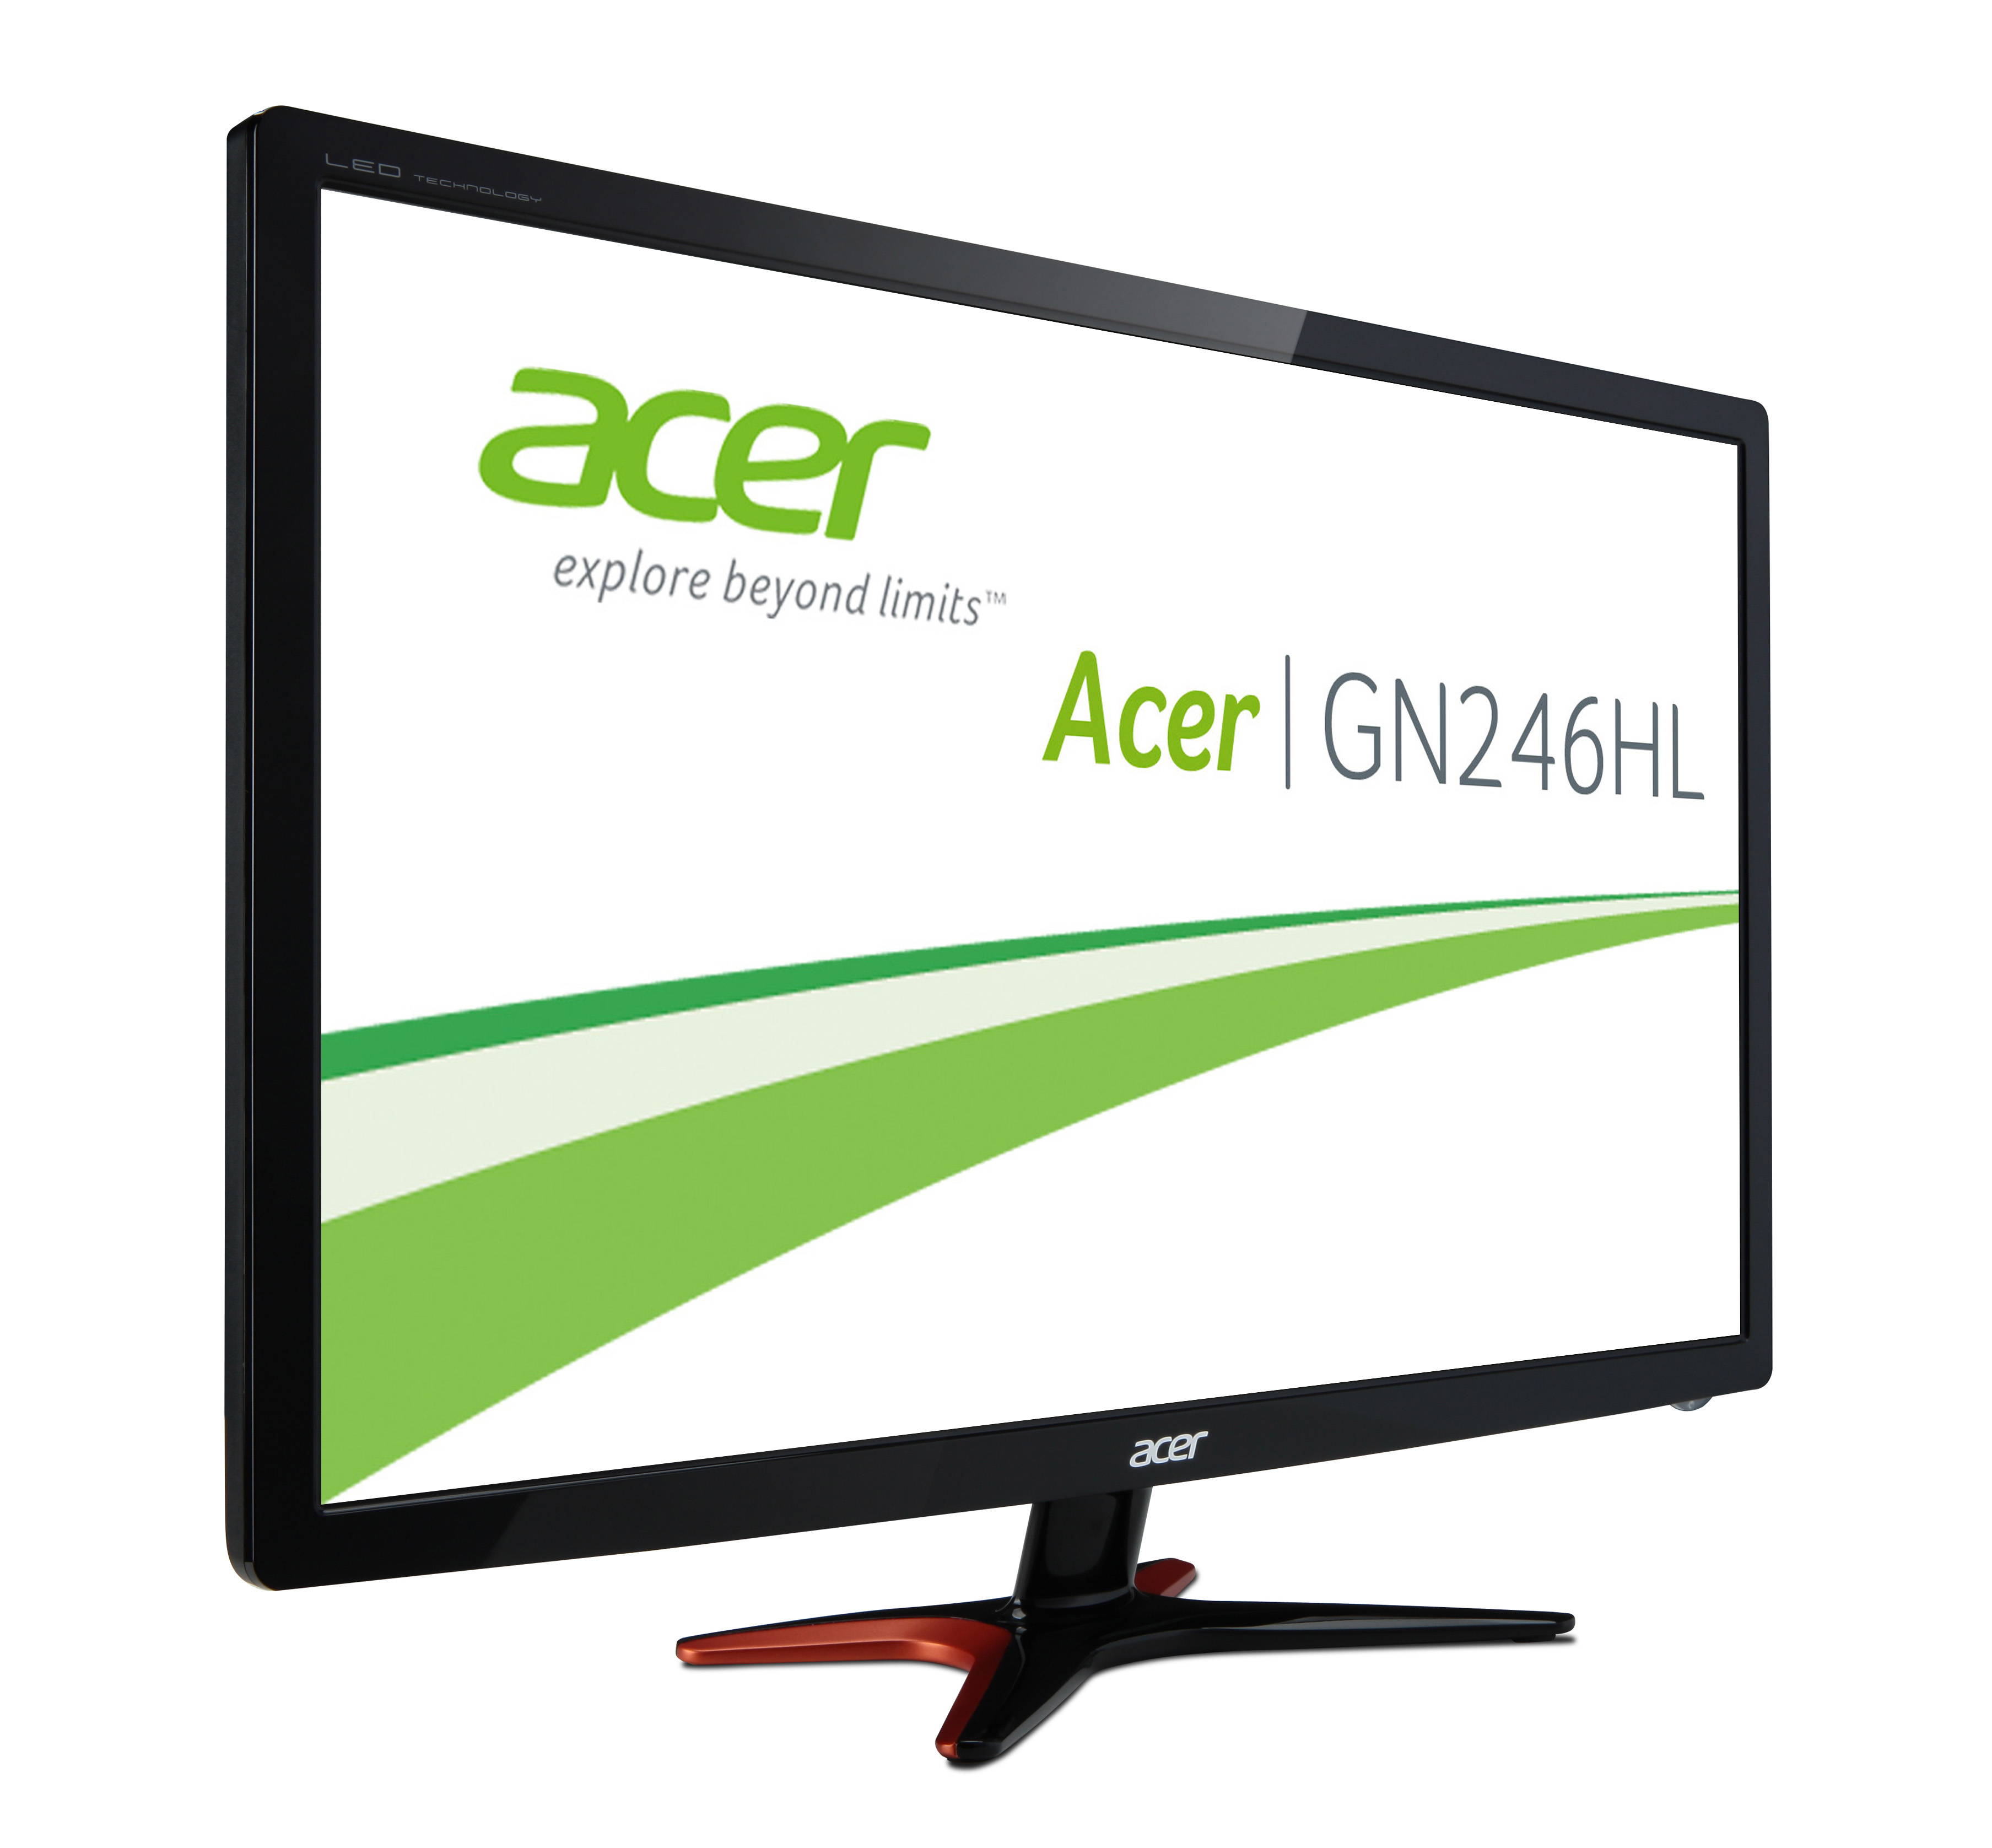 Acer Gaming Monitor GN246Hlb, 24 inch, 1920x1080, 1ms, 144Hz, TN, DVI/HDMI/VGA, VESA, Black ***